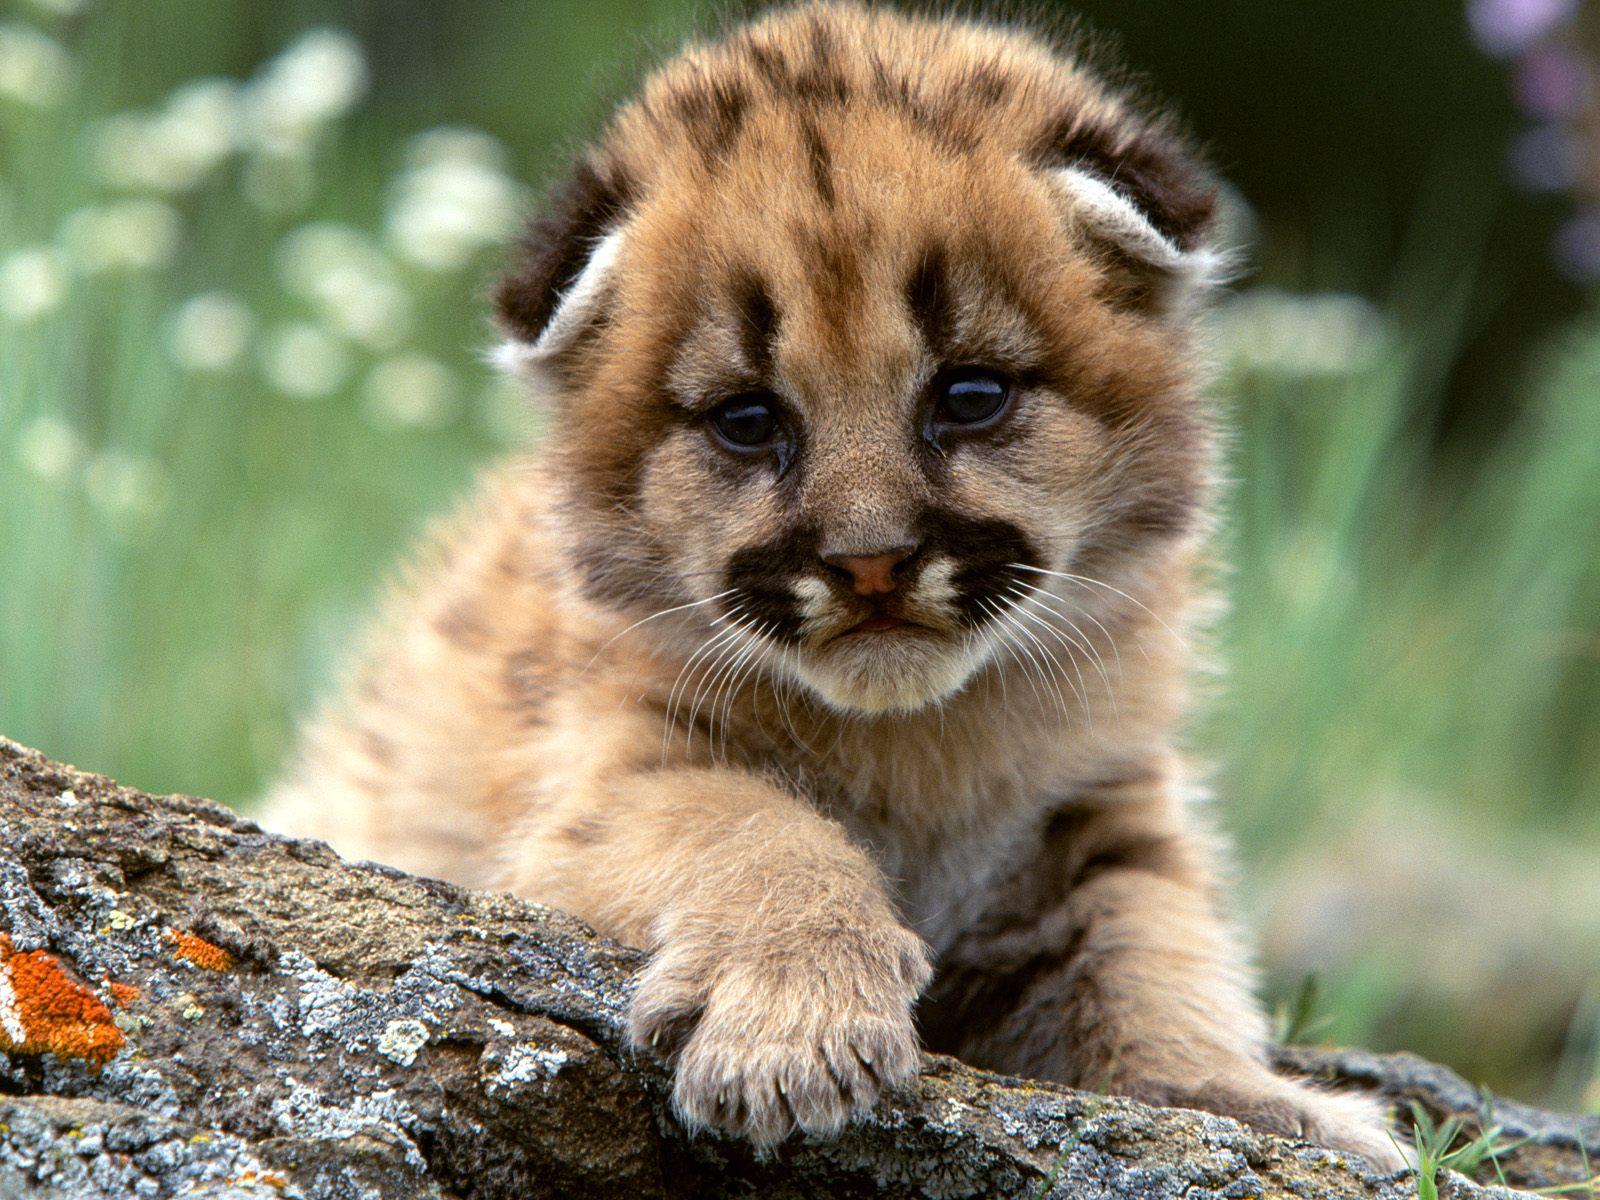 download free animal images google adsense a 2 z new tricks